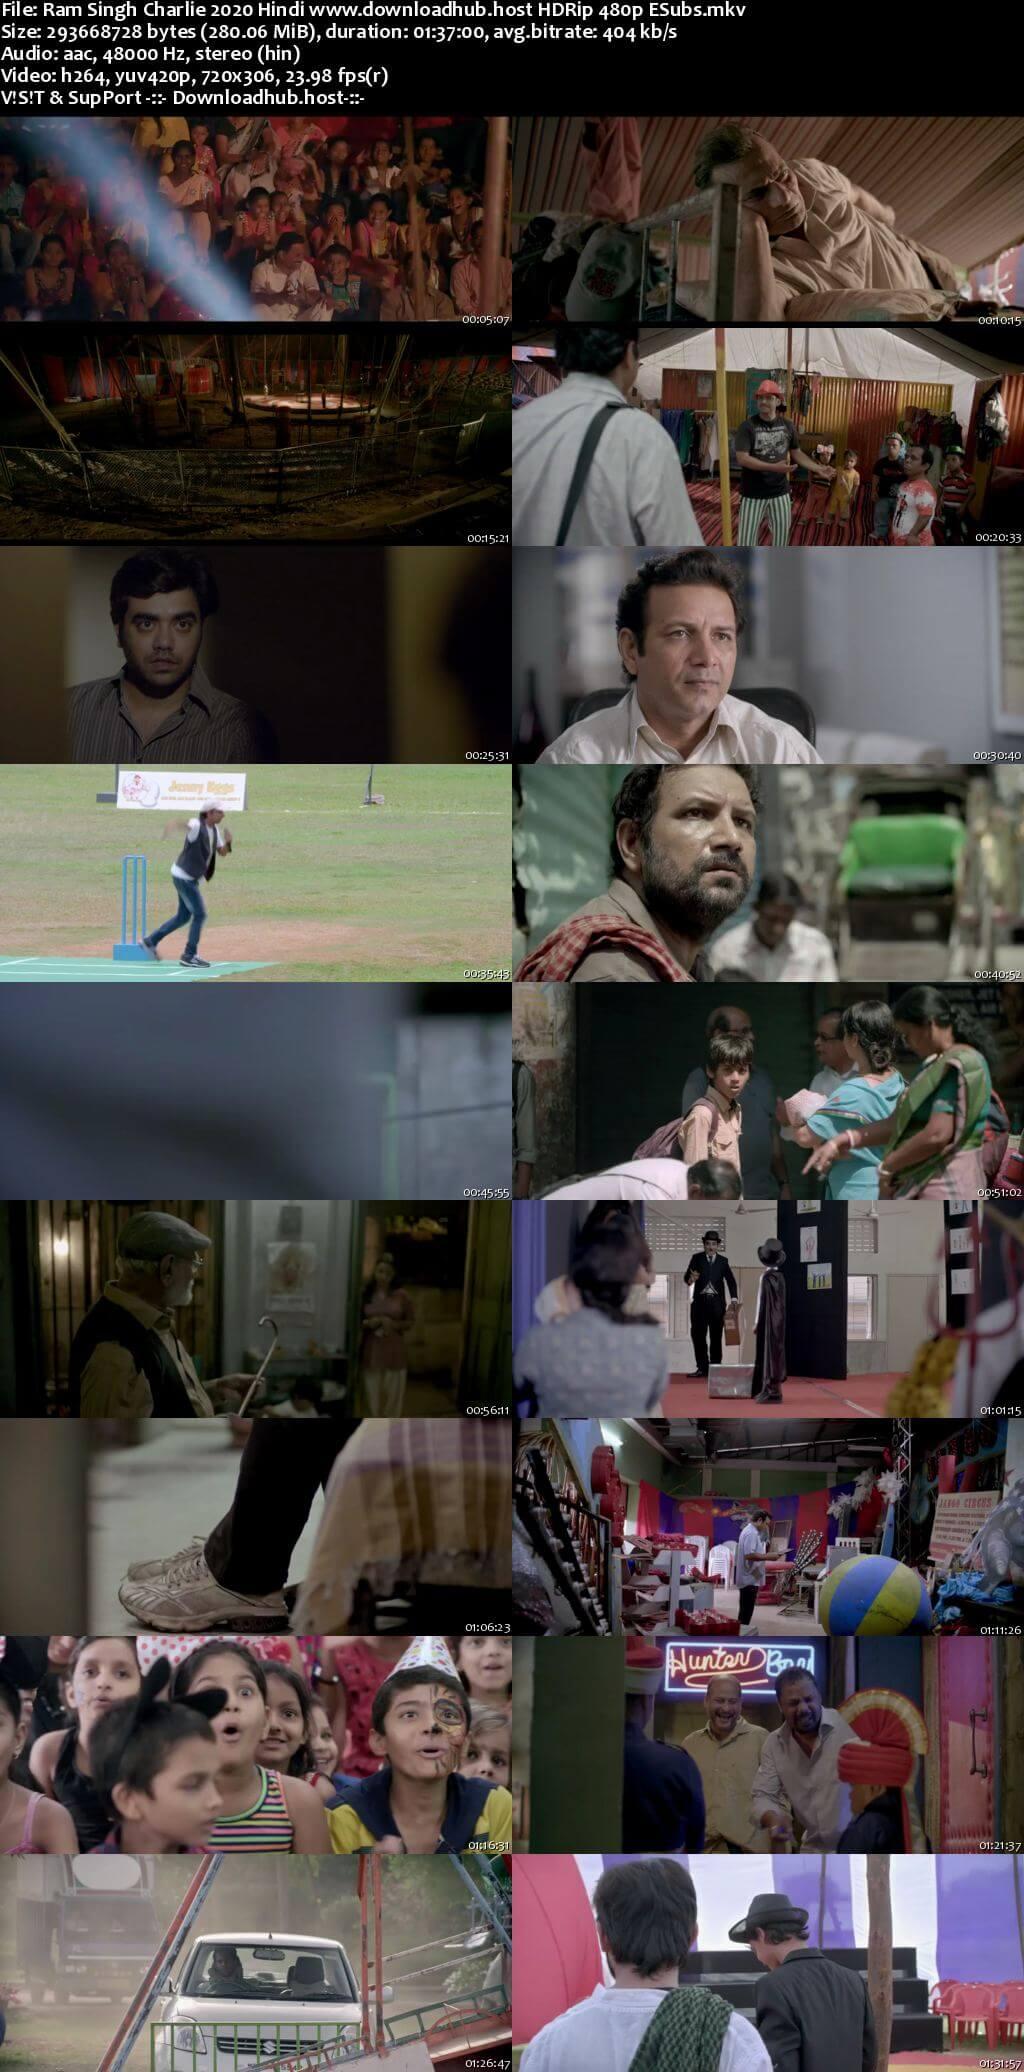 Ram Singh Charlie 2020 Hindi 280MB HDRip 480p ESubs